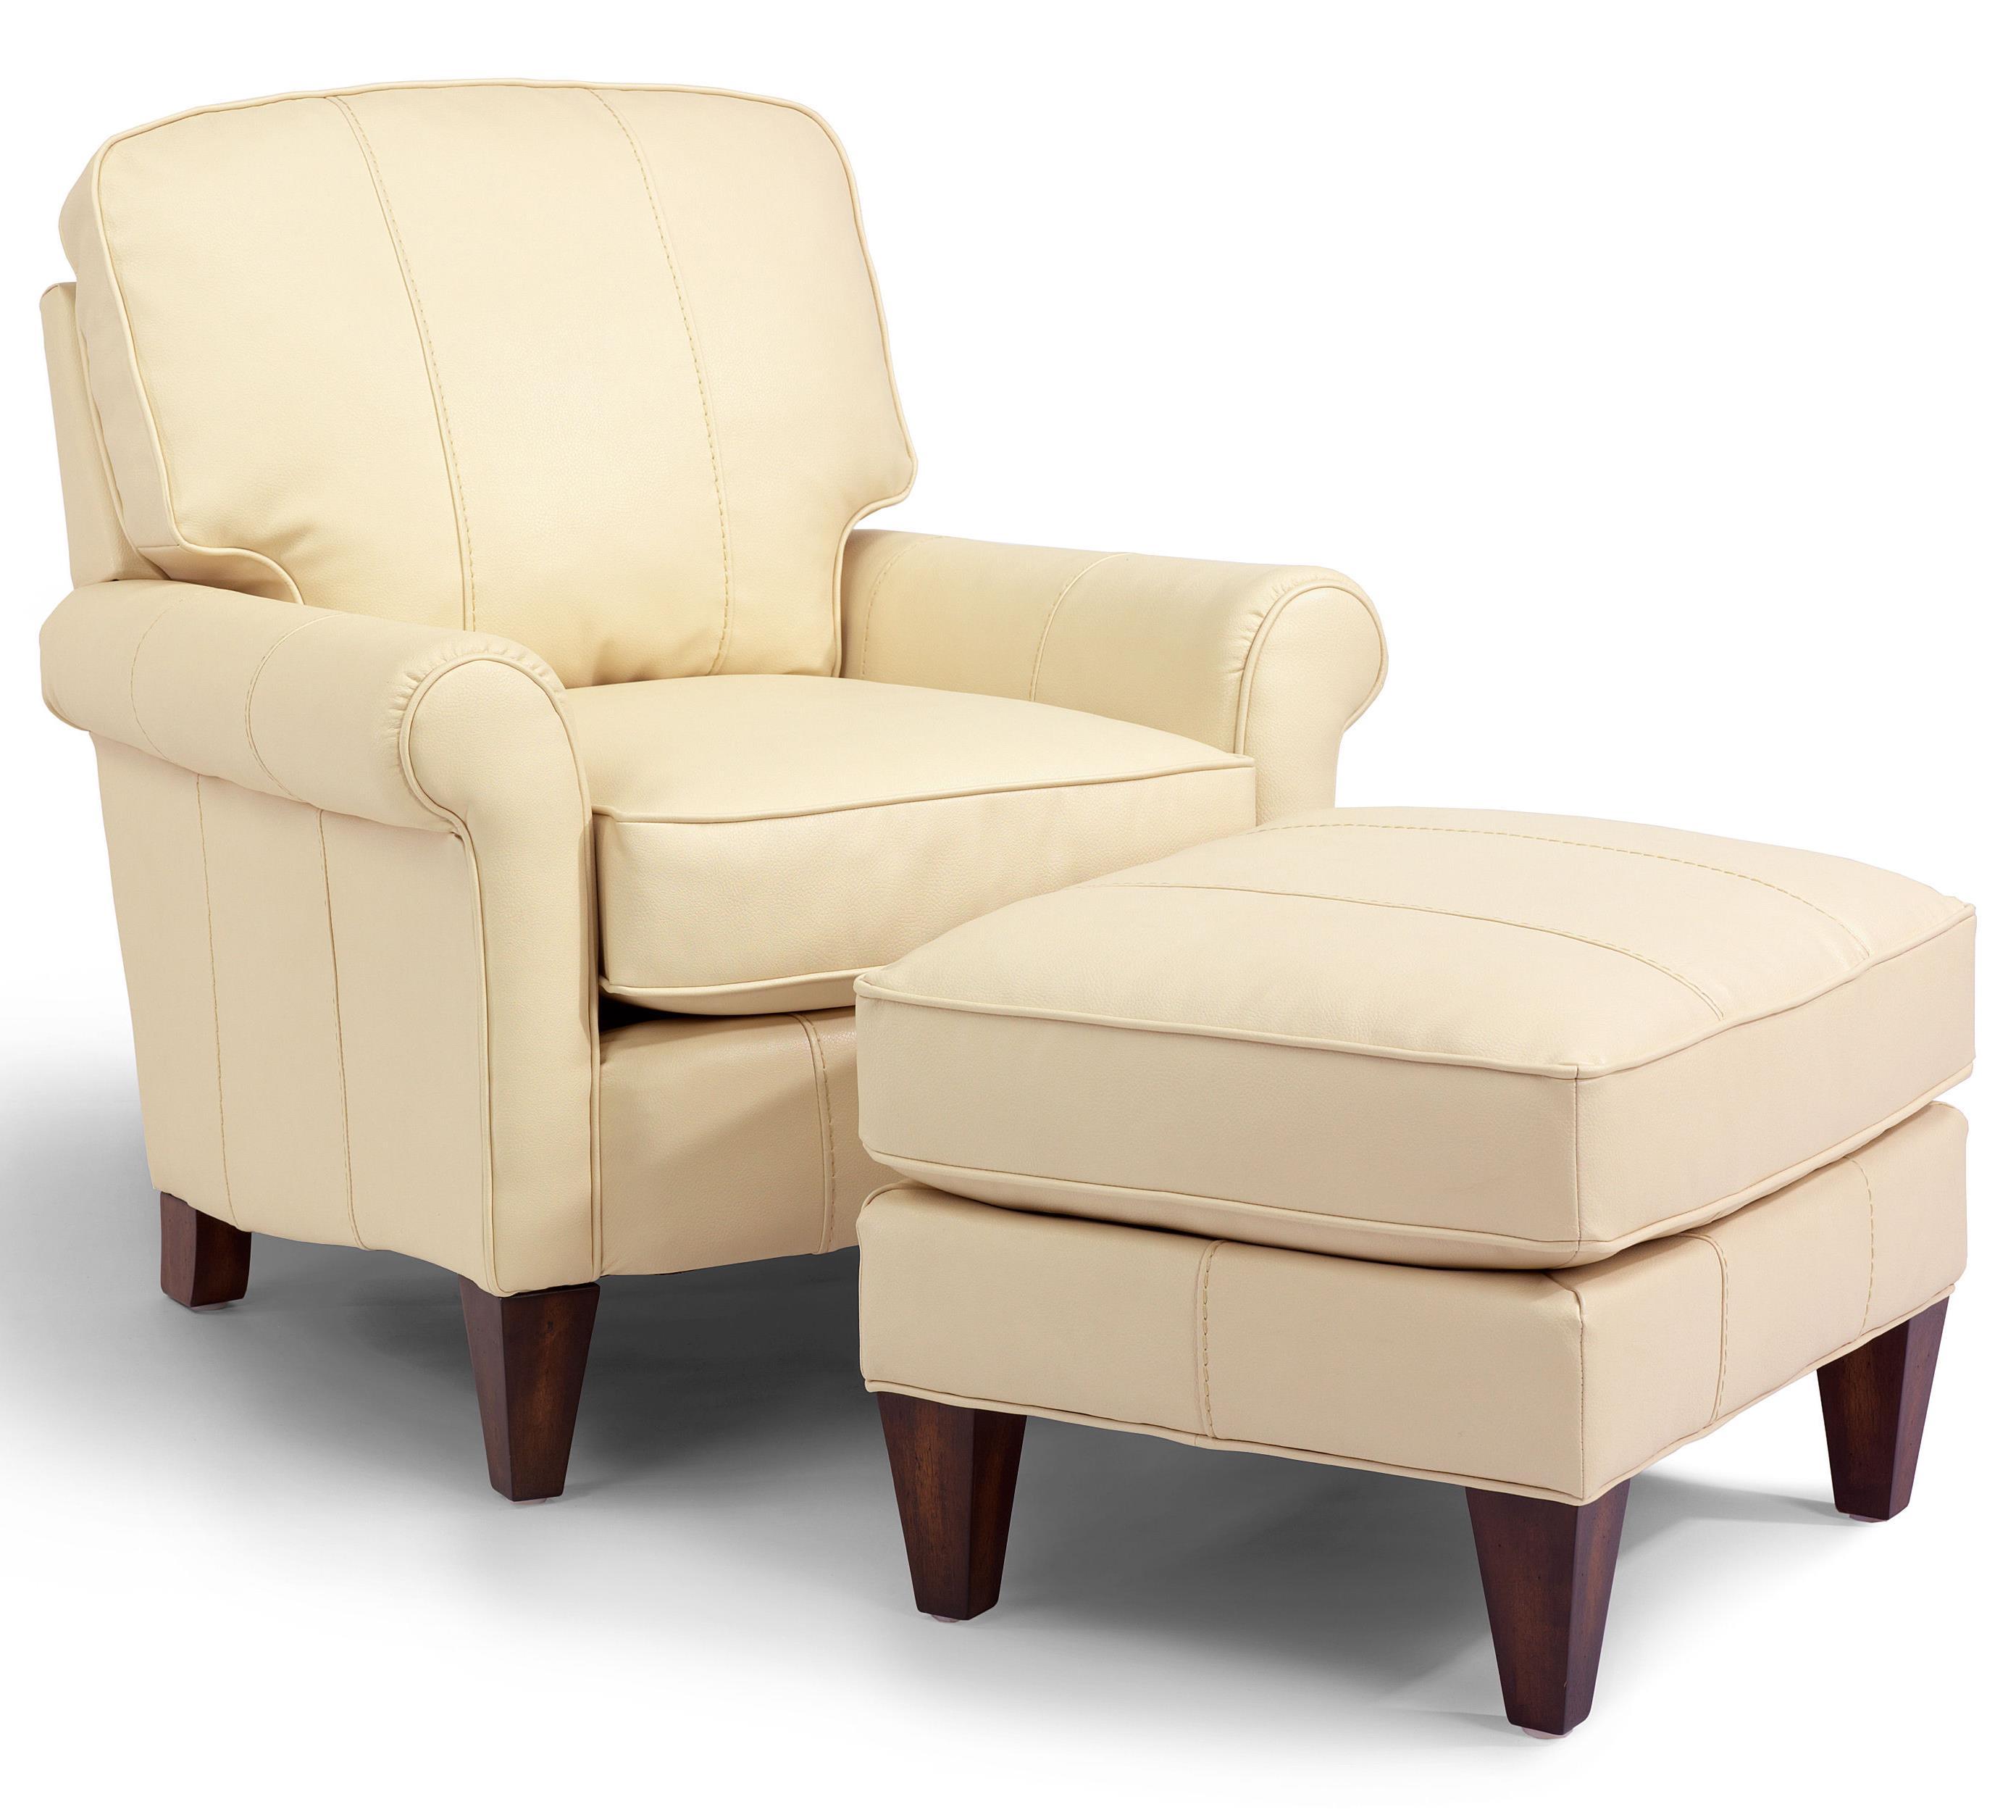 harvard chair for sale recliner accent chairs flexsteel accents belfort furniture